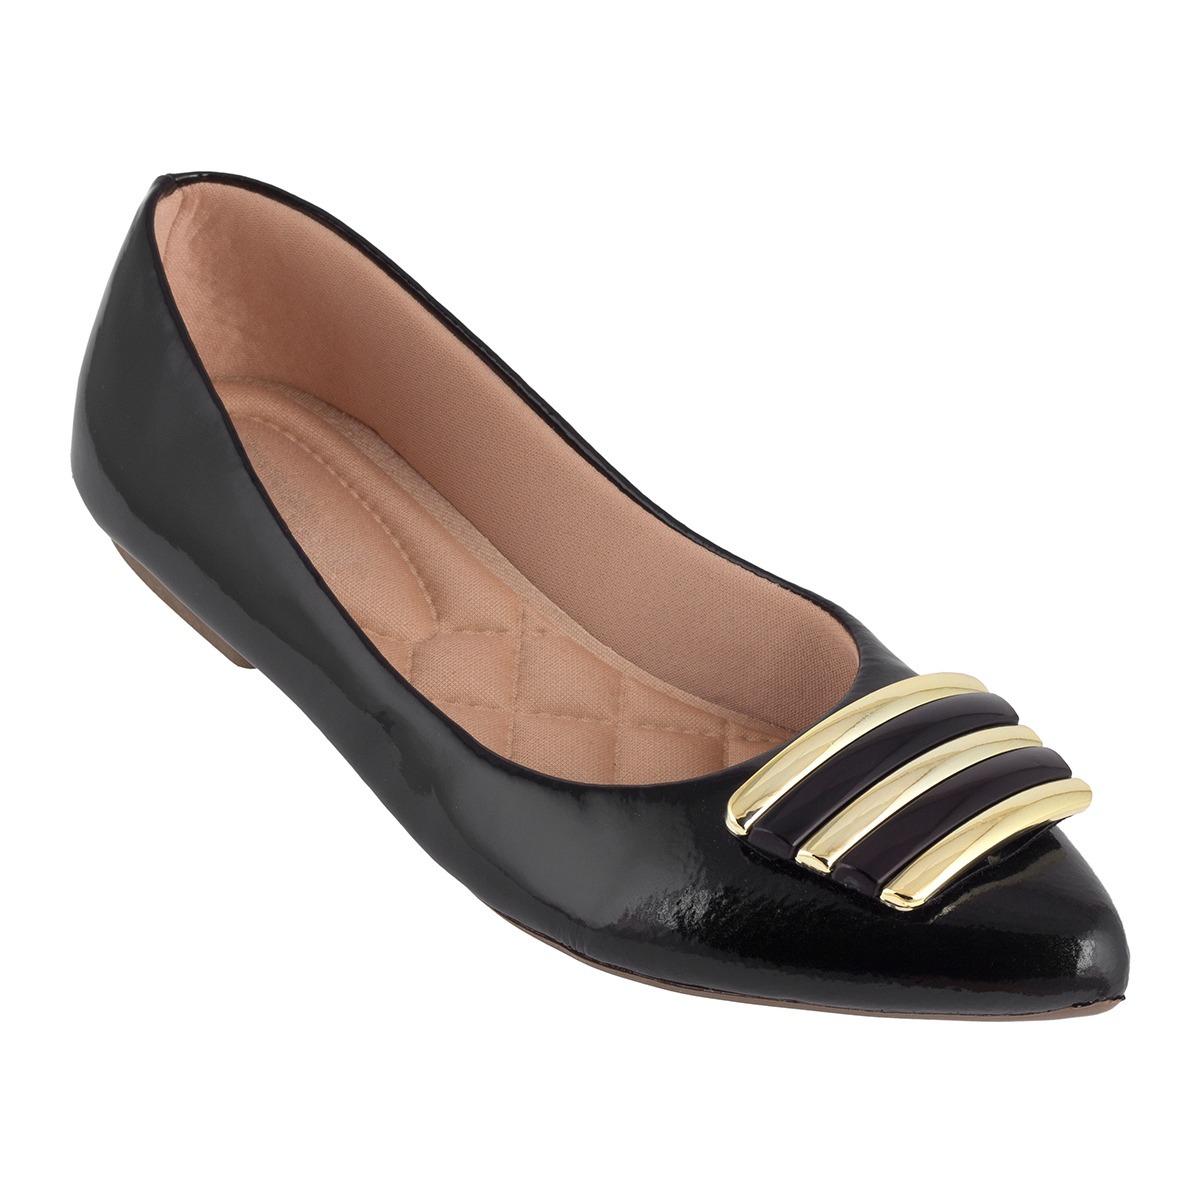 16026f146 sapatilhas feminina bico fino verniz linda /confortavel lht. Carregando  zoom.